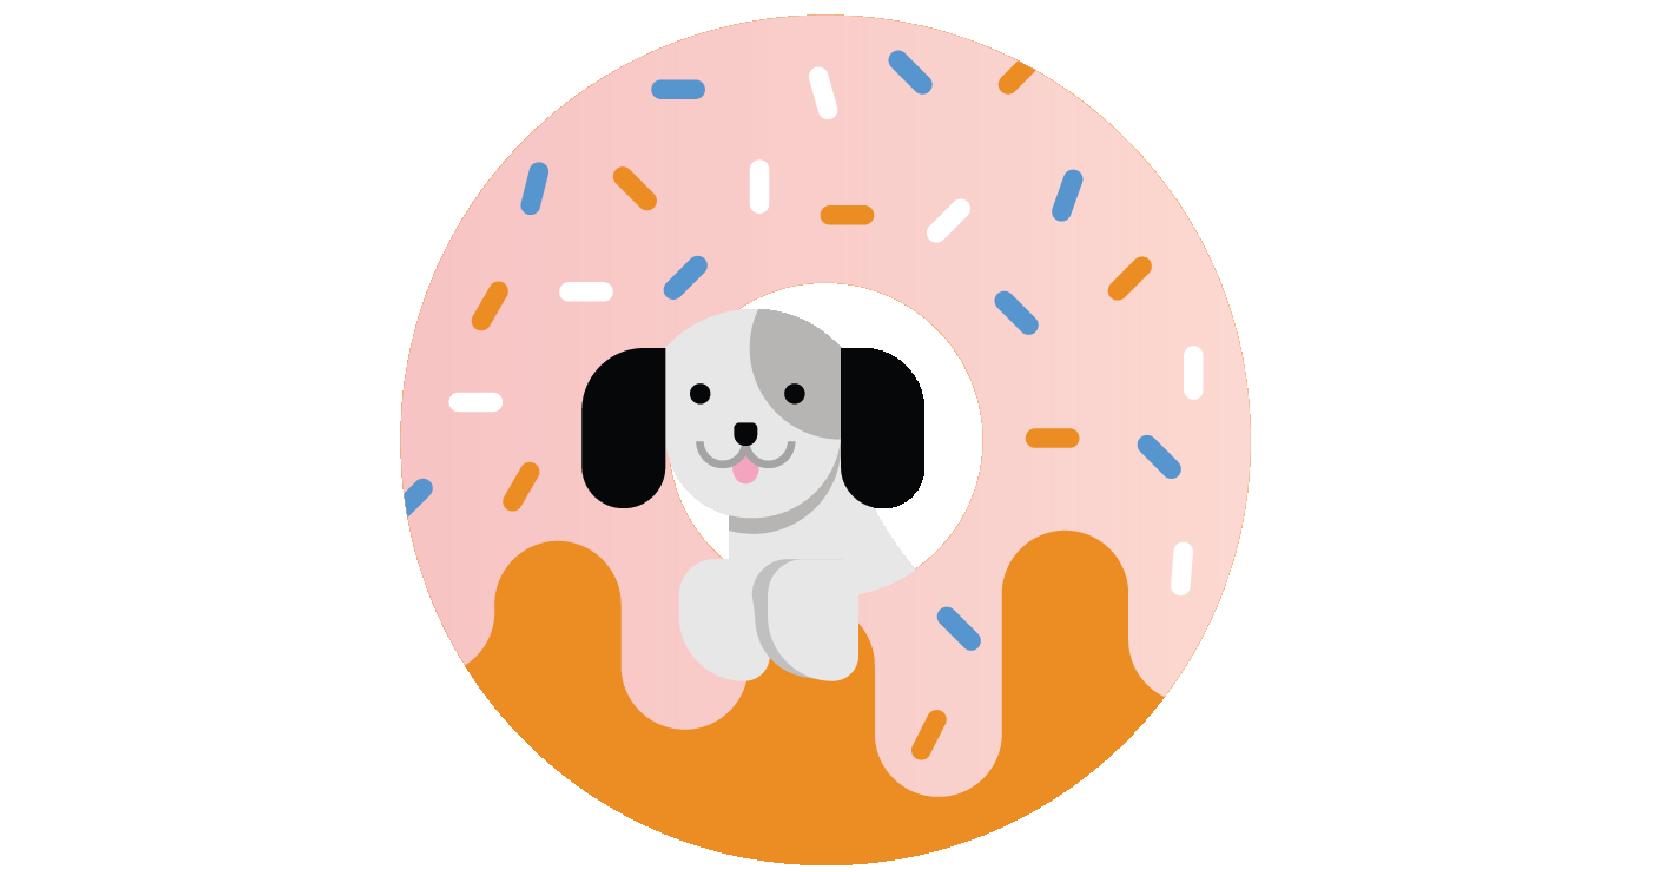 Puppies and Donuts_Mug_2.5inX2.5in_Print_R1-01-01.png